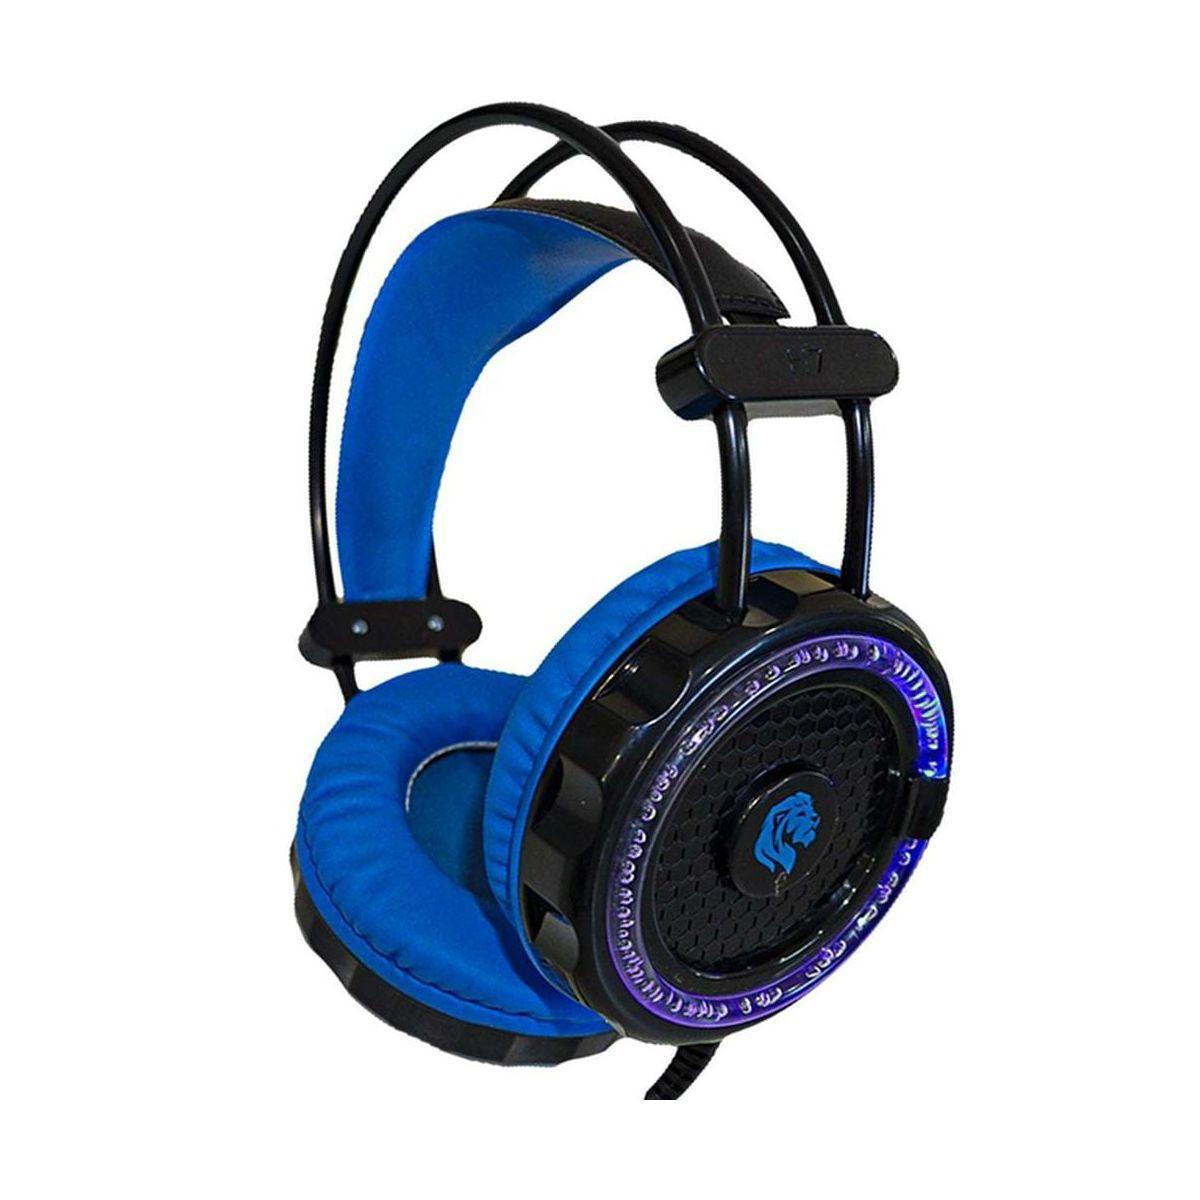 Headset Gamer Hayom 40mm Com Microfone e Led HF-2201